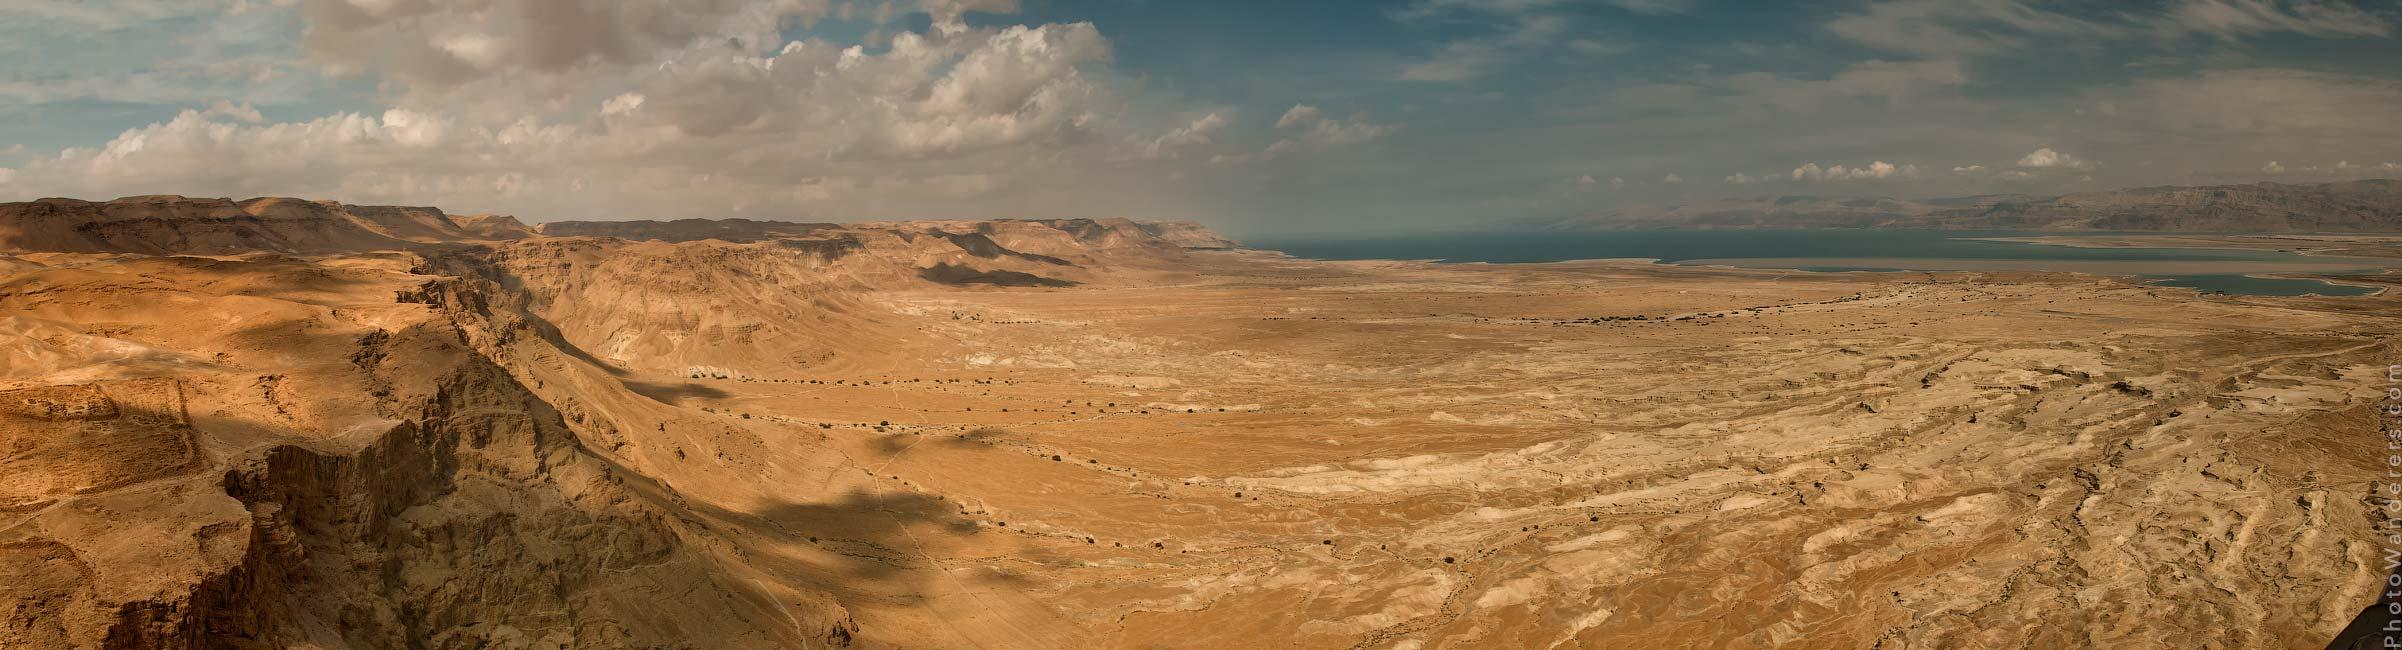 Вид со стен крепости Масады на Мертвое море (View from Masada to Dead Sea), Израиль